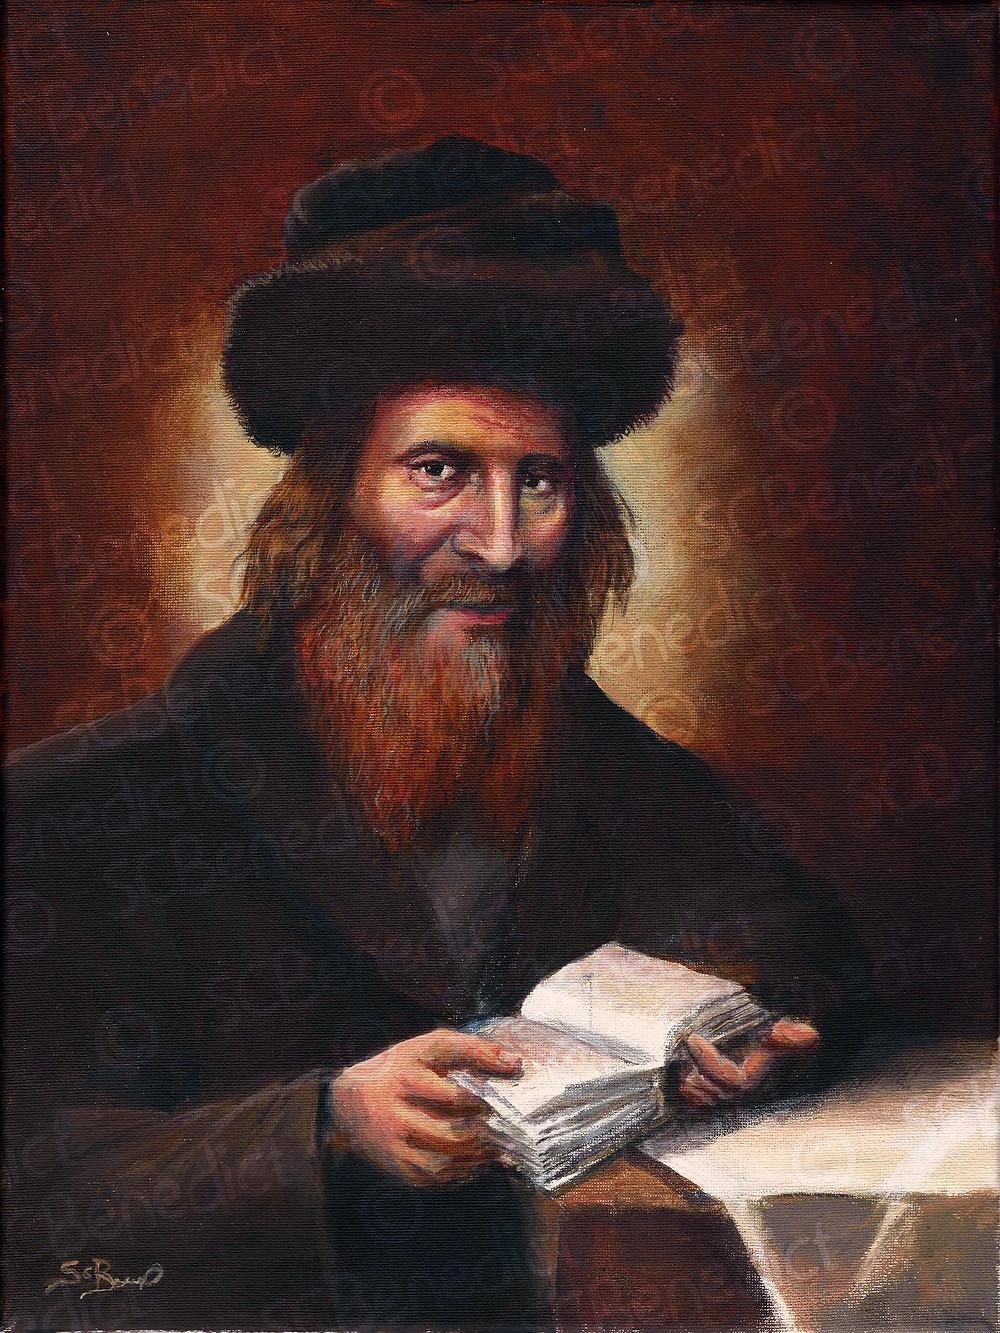 Chasam Sofer - חתם סופר painting by s c benedict